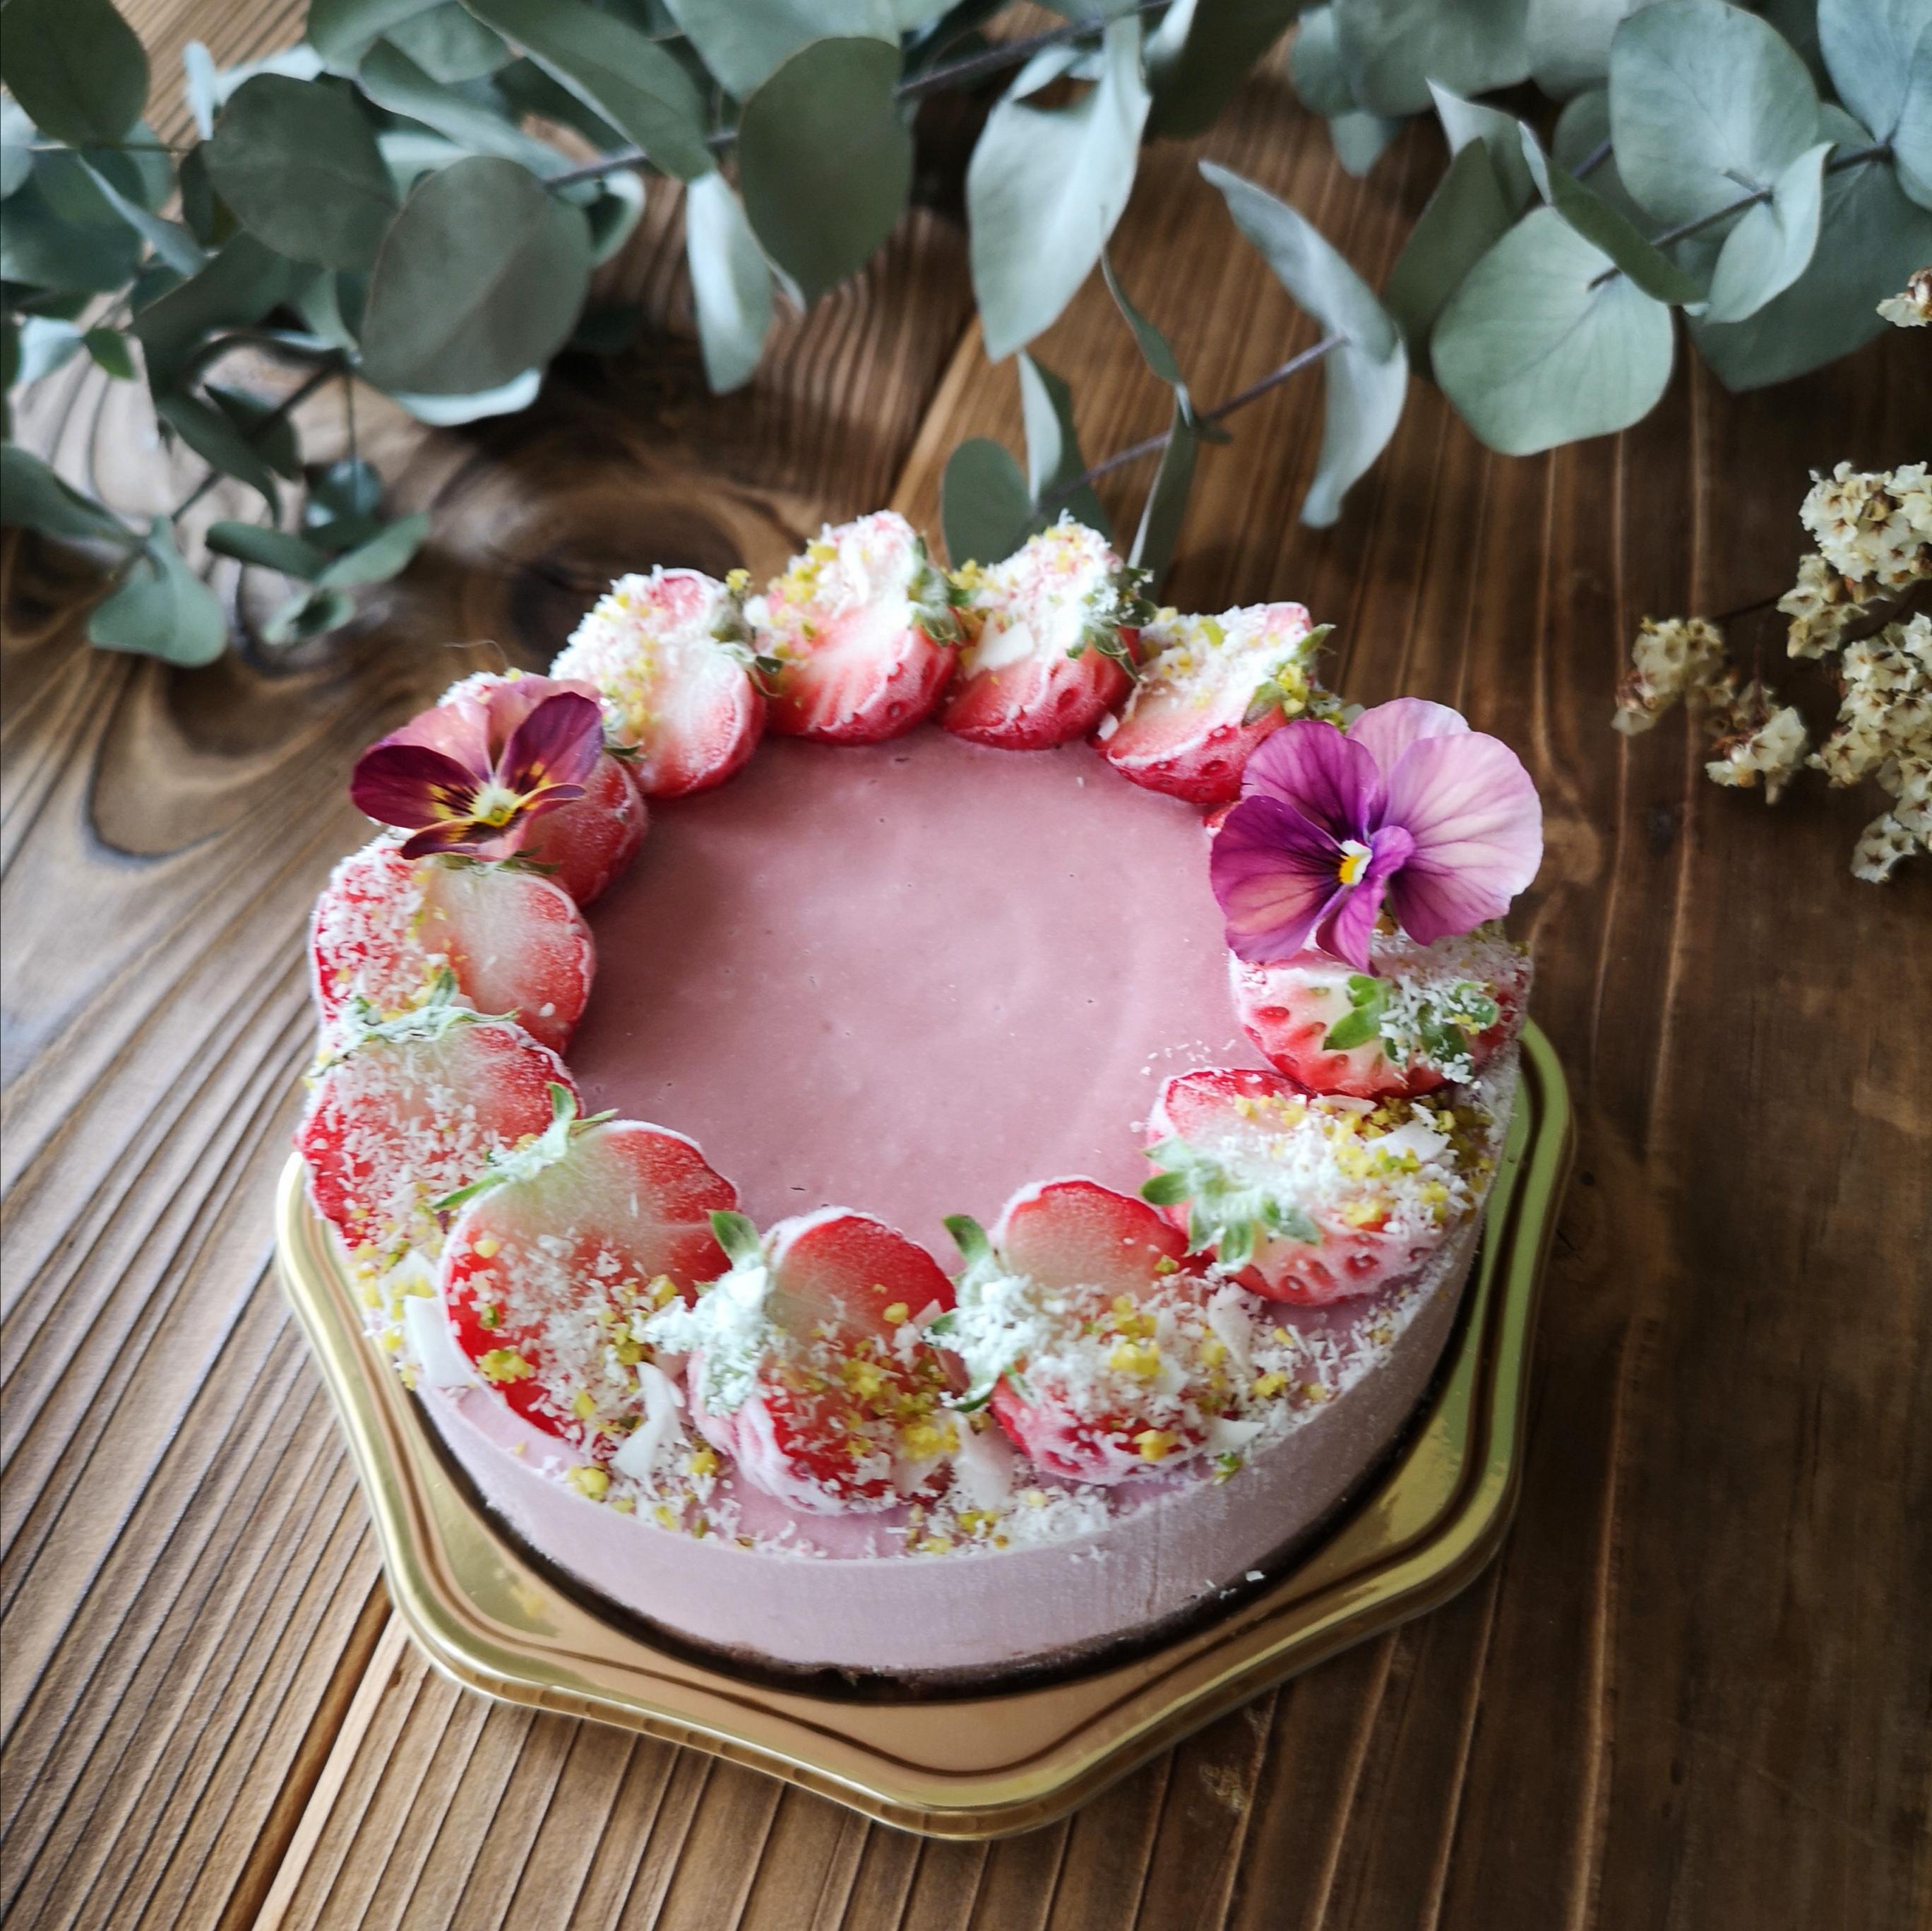 Strawberry Raw Cheese Cake  SSサイズ(12㎝ 約4〜6名様分)